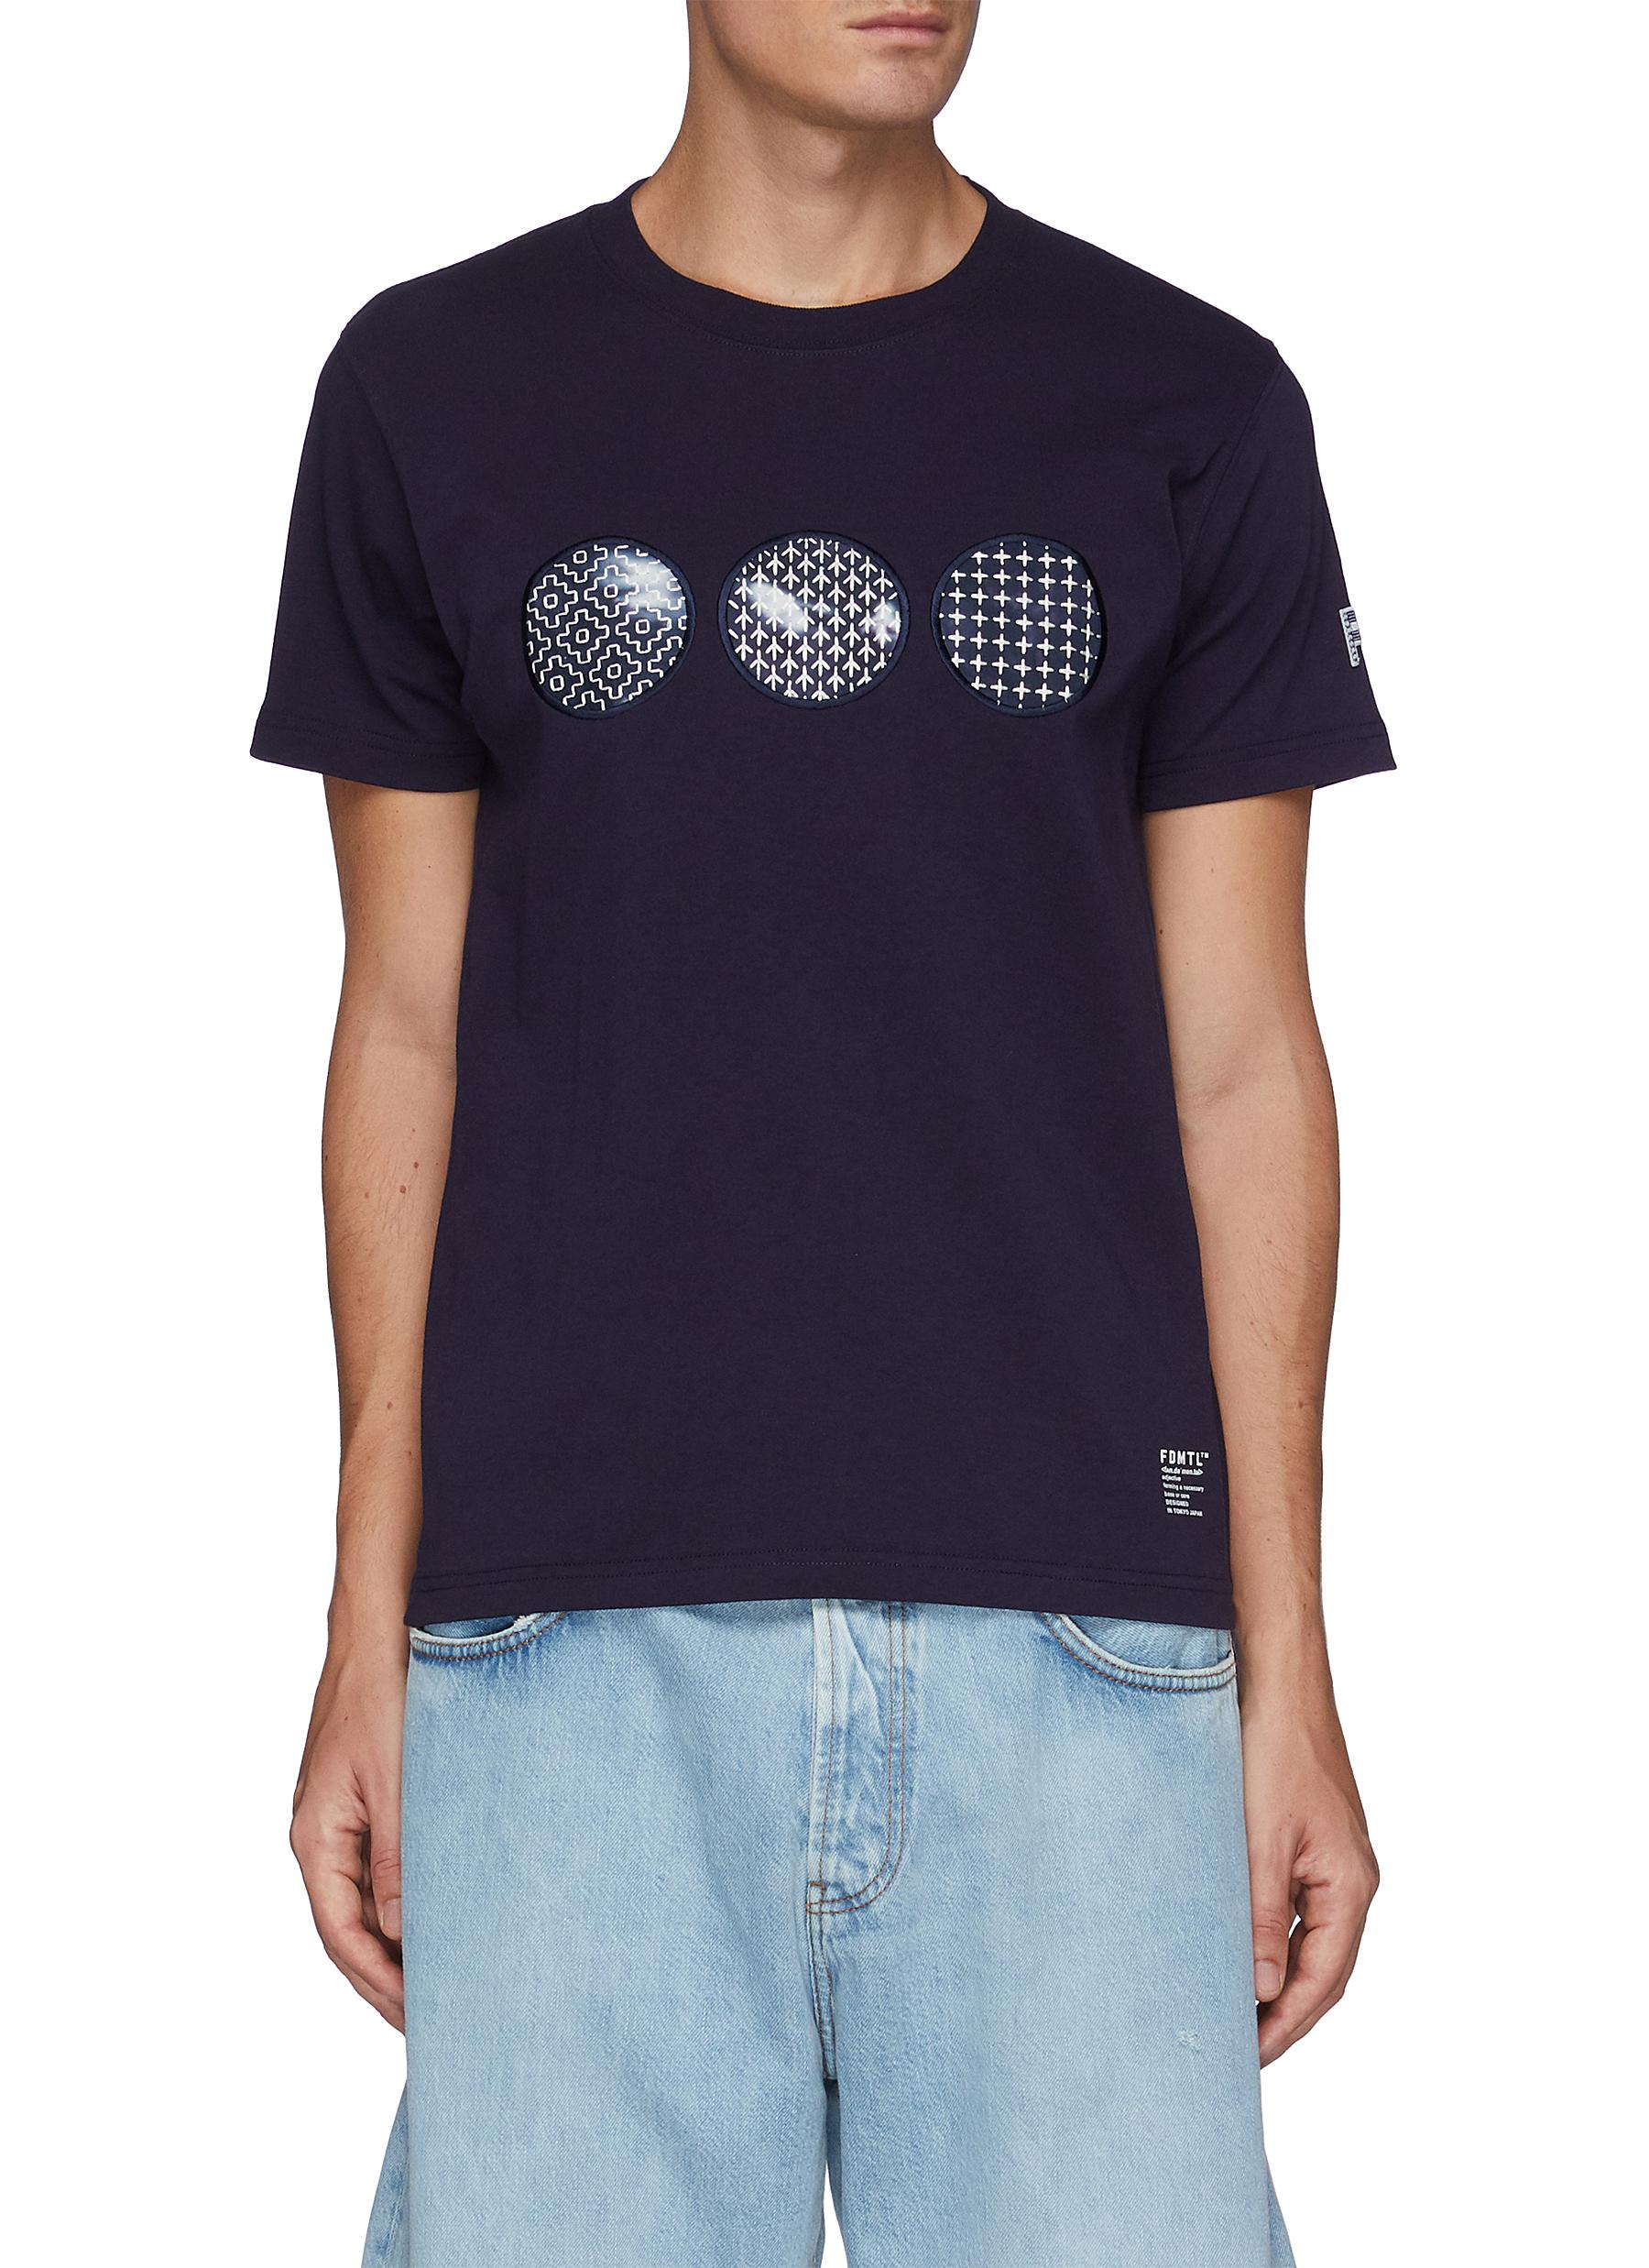 Sashiko Circle Patch Crewneck Cotton T-shirt